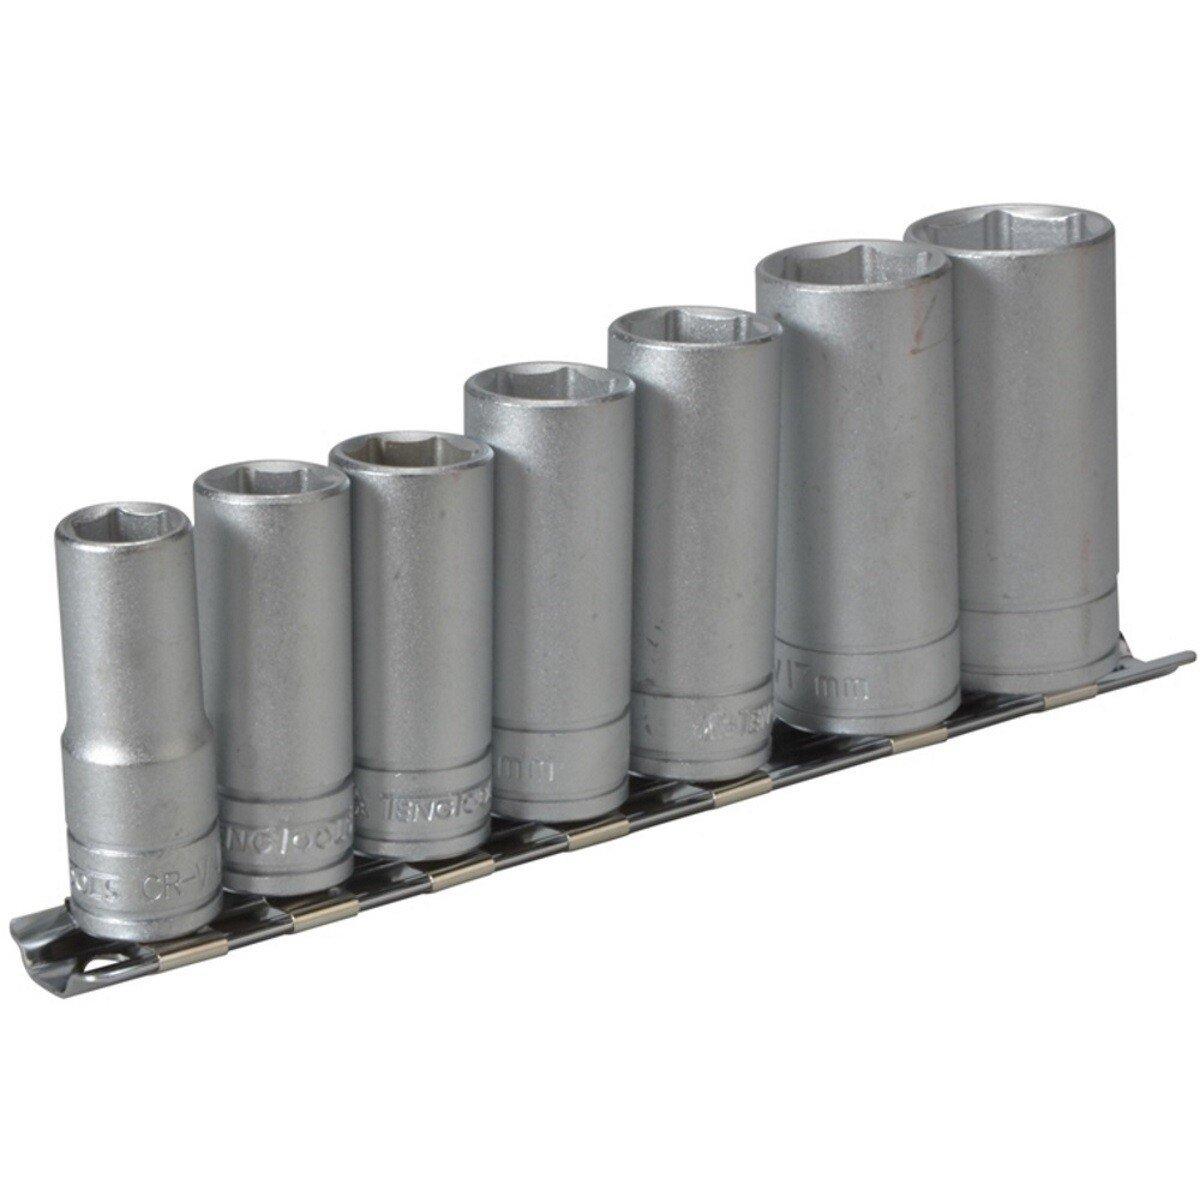 "Teng Tools M3807 7 Piece Clip Rail Socket Set Metric 3/8"" Drive TENM3807"